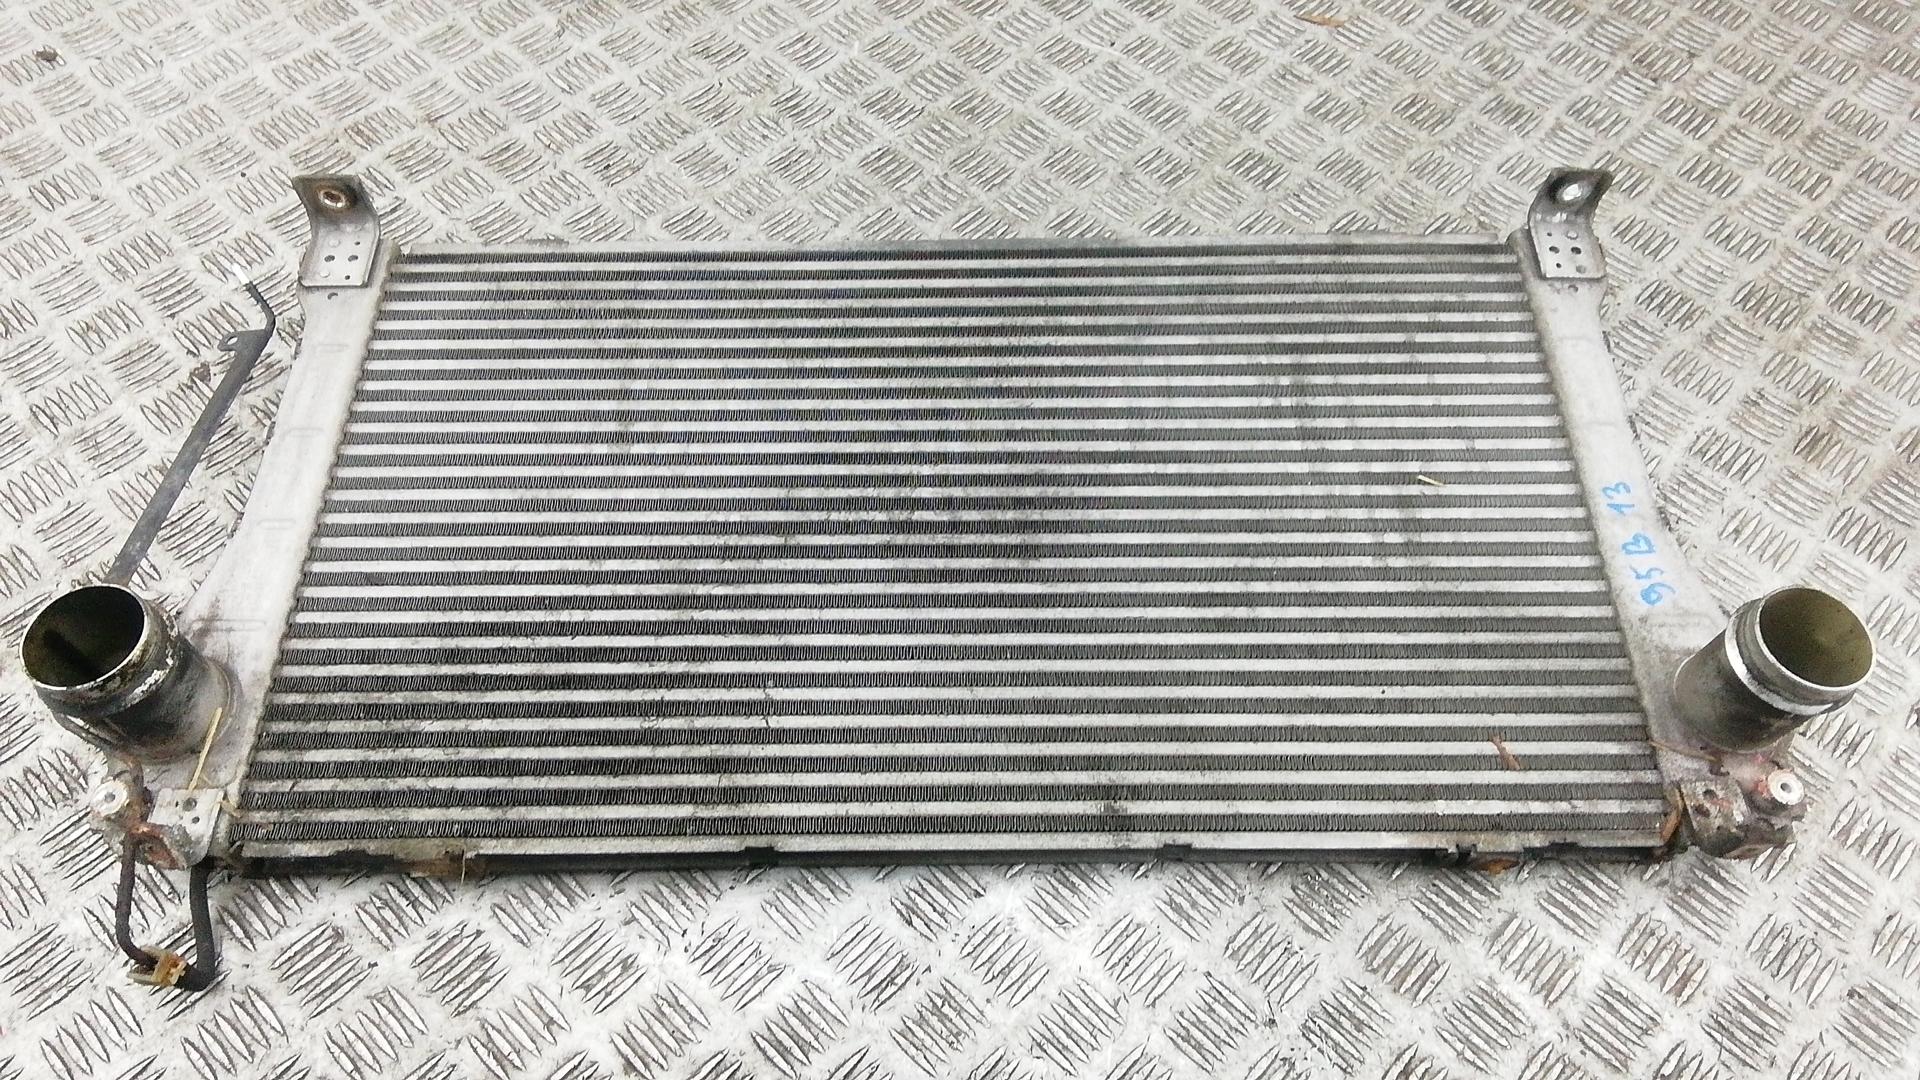 Радиатор интеркуллера, TOYOTA, AURIS E150, 2009